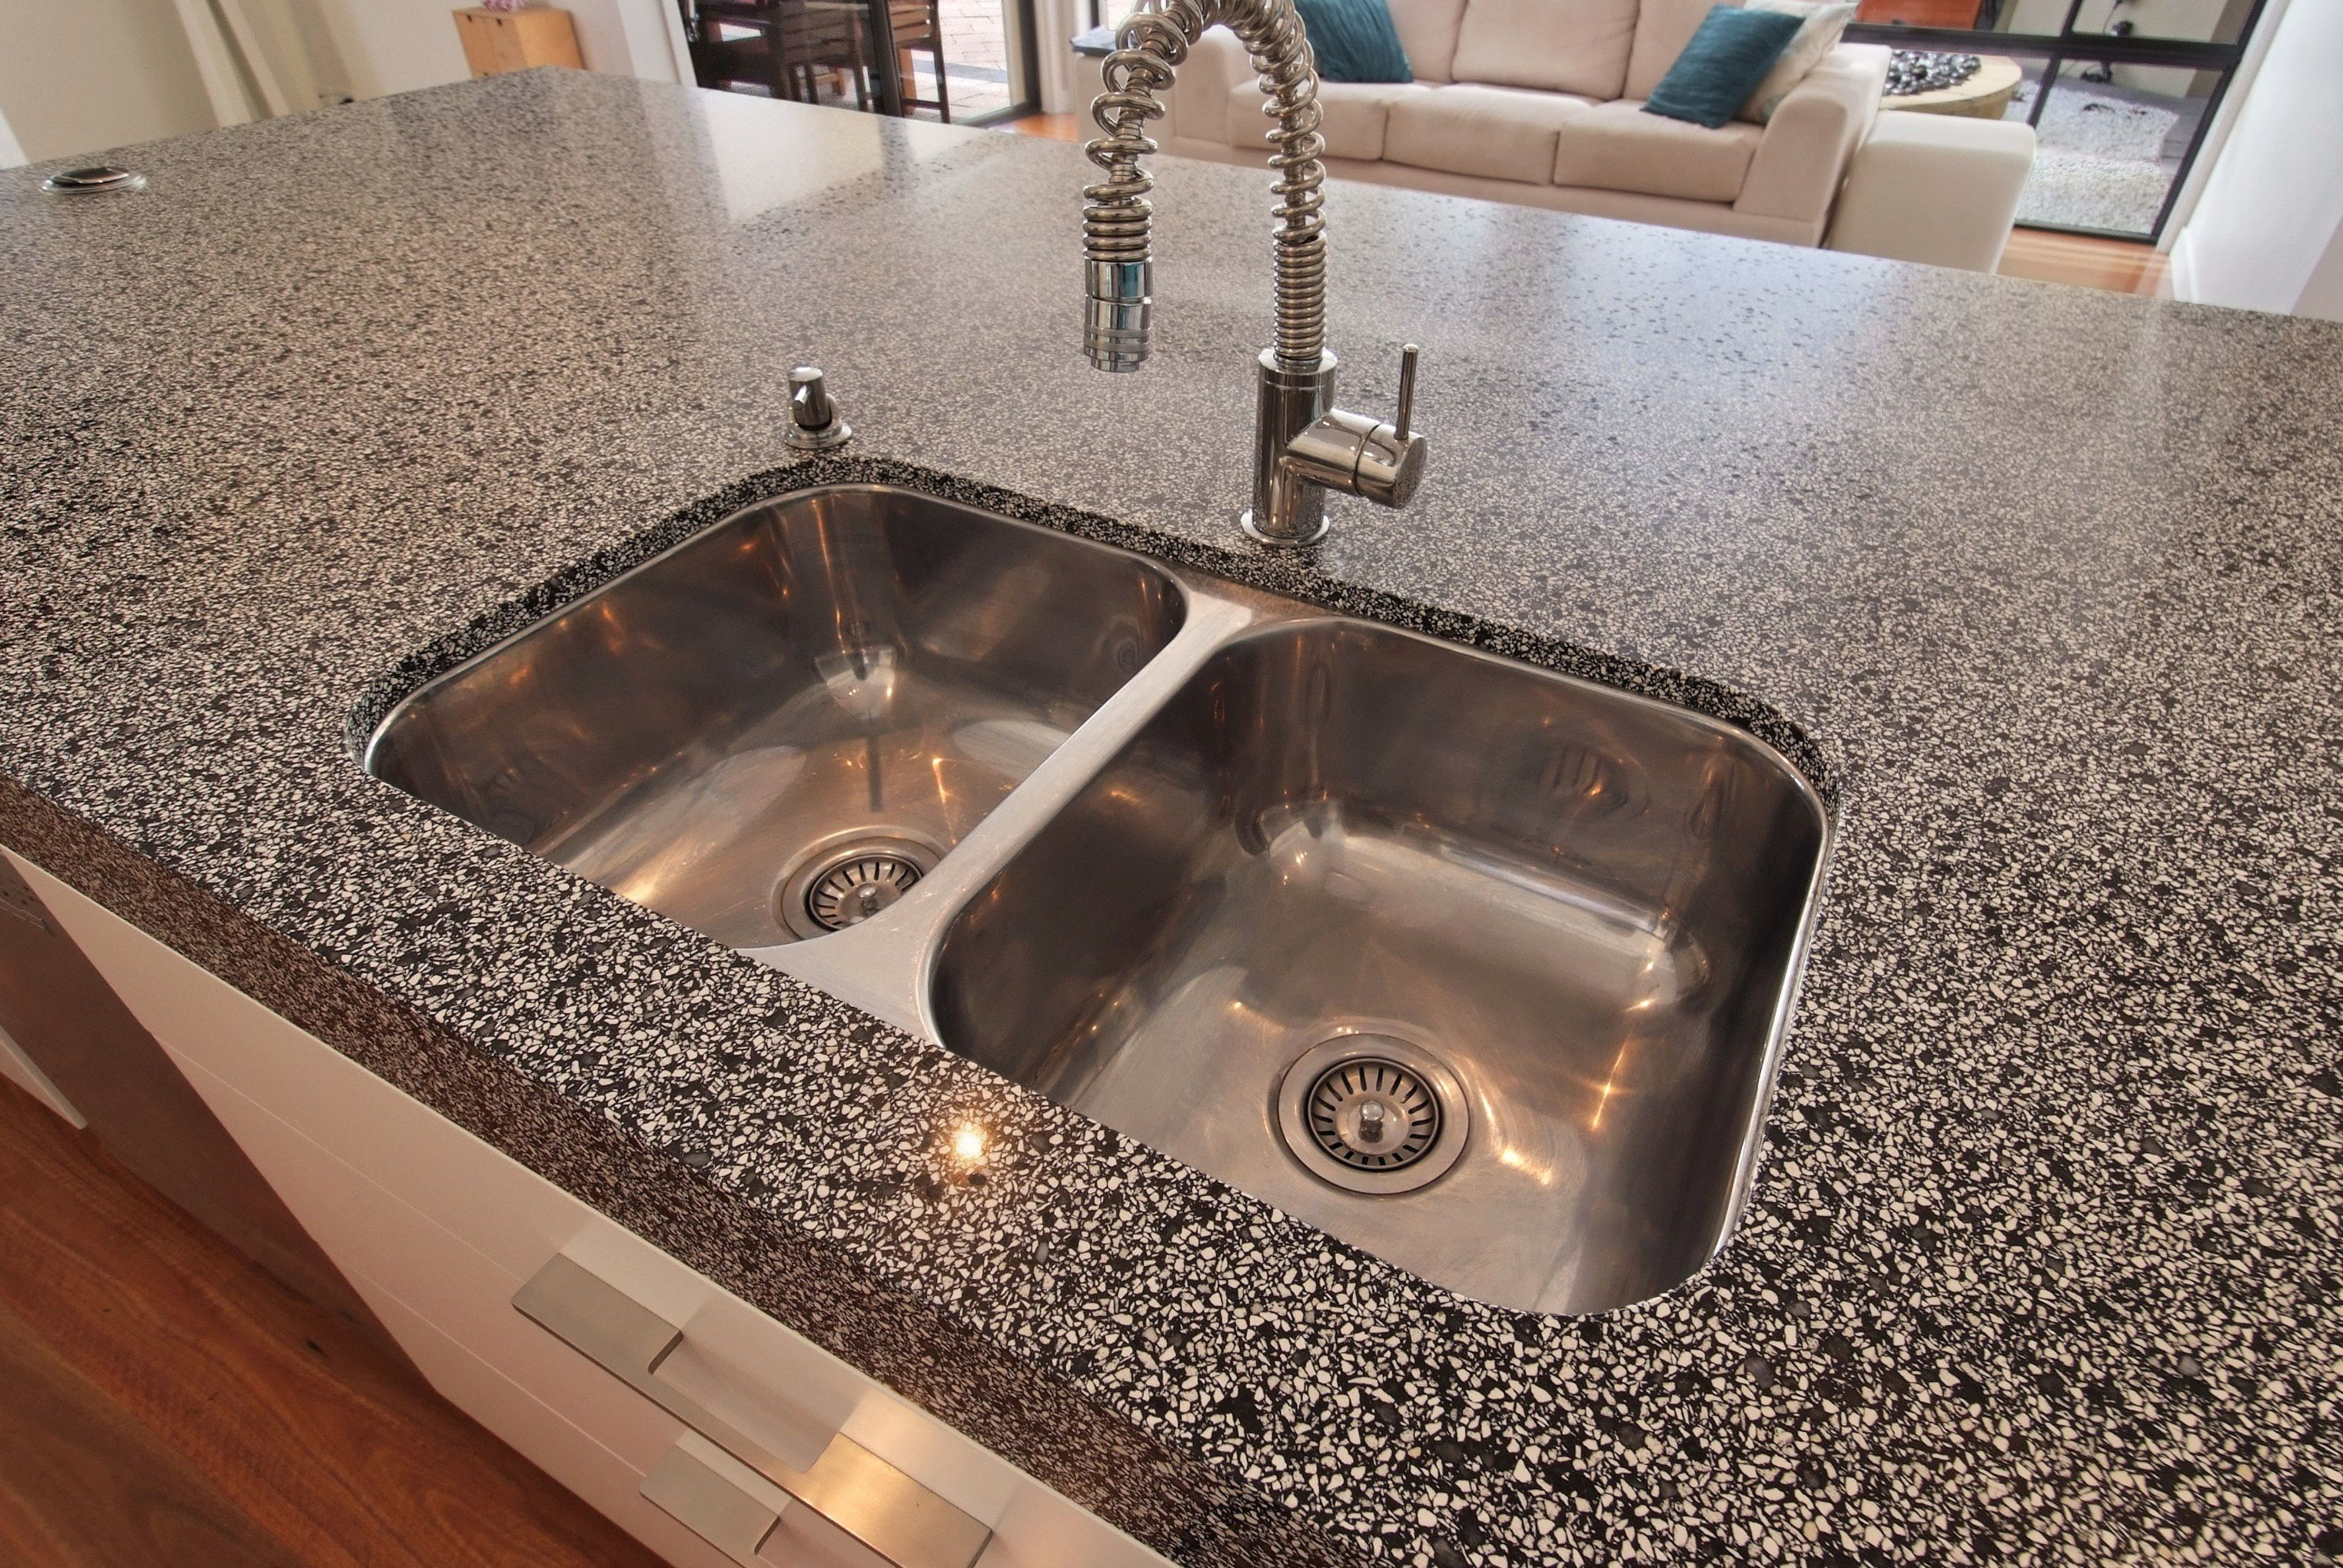 Bathroom Undermount Sinks Bathroom  Undermount Kitchen Sinks Interesting Undermount Kitchen Sink Review